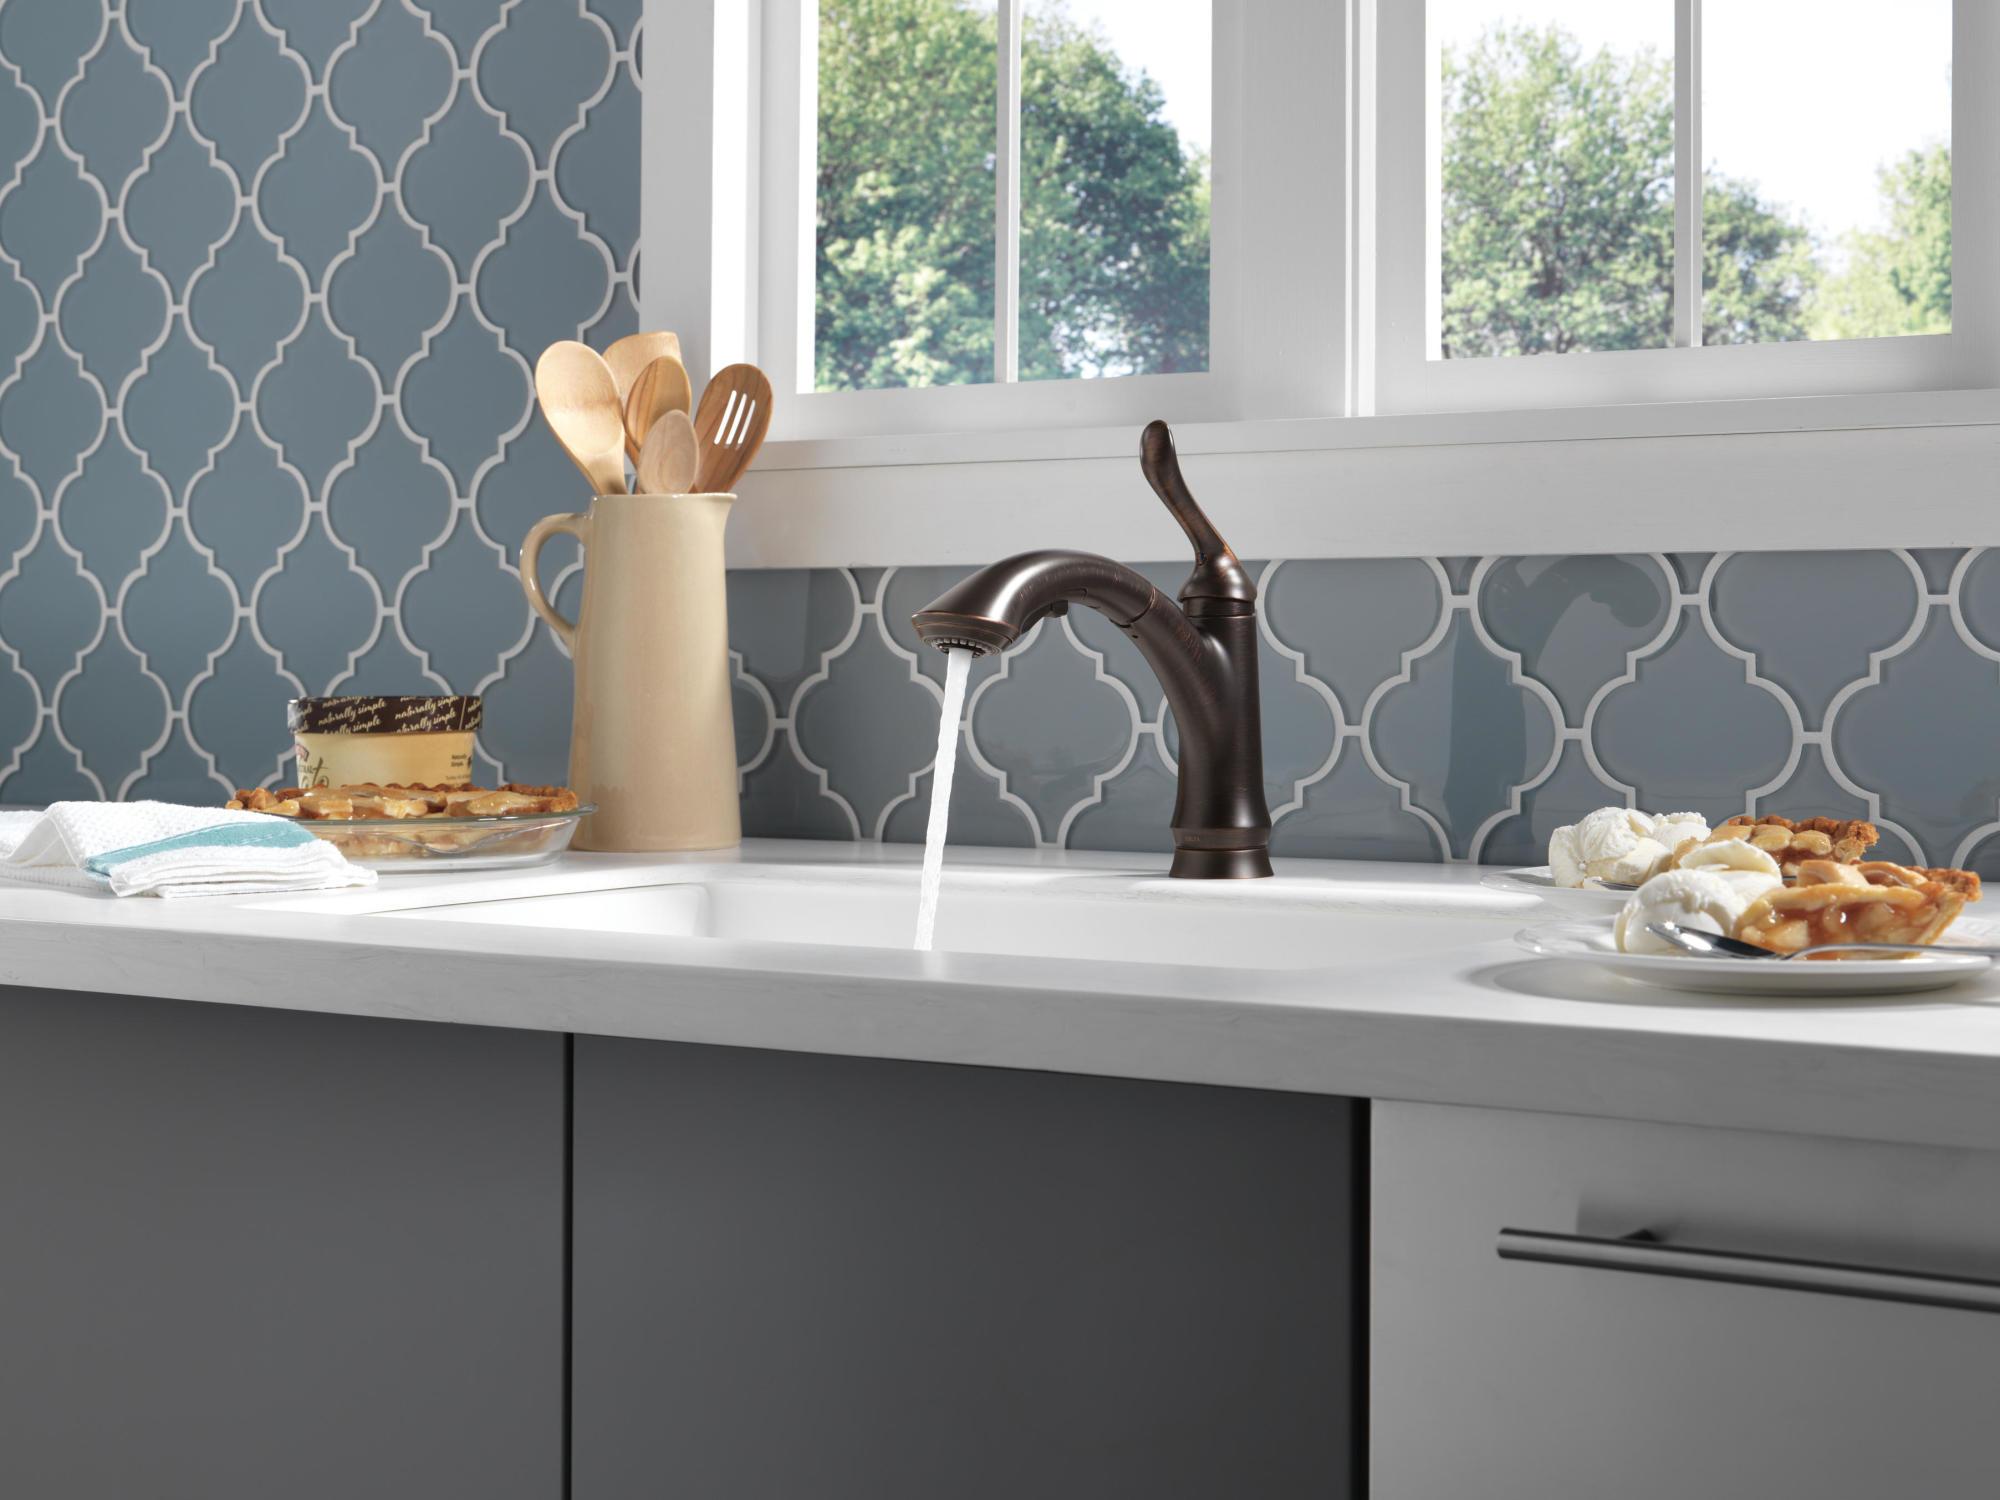 delta 4353-dst linden pull-out kitchen faucet - arctic